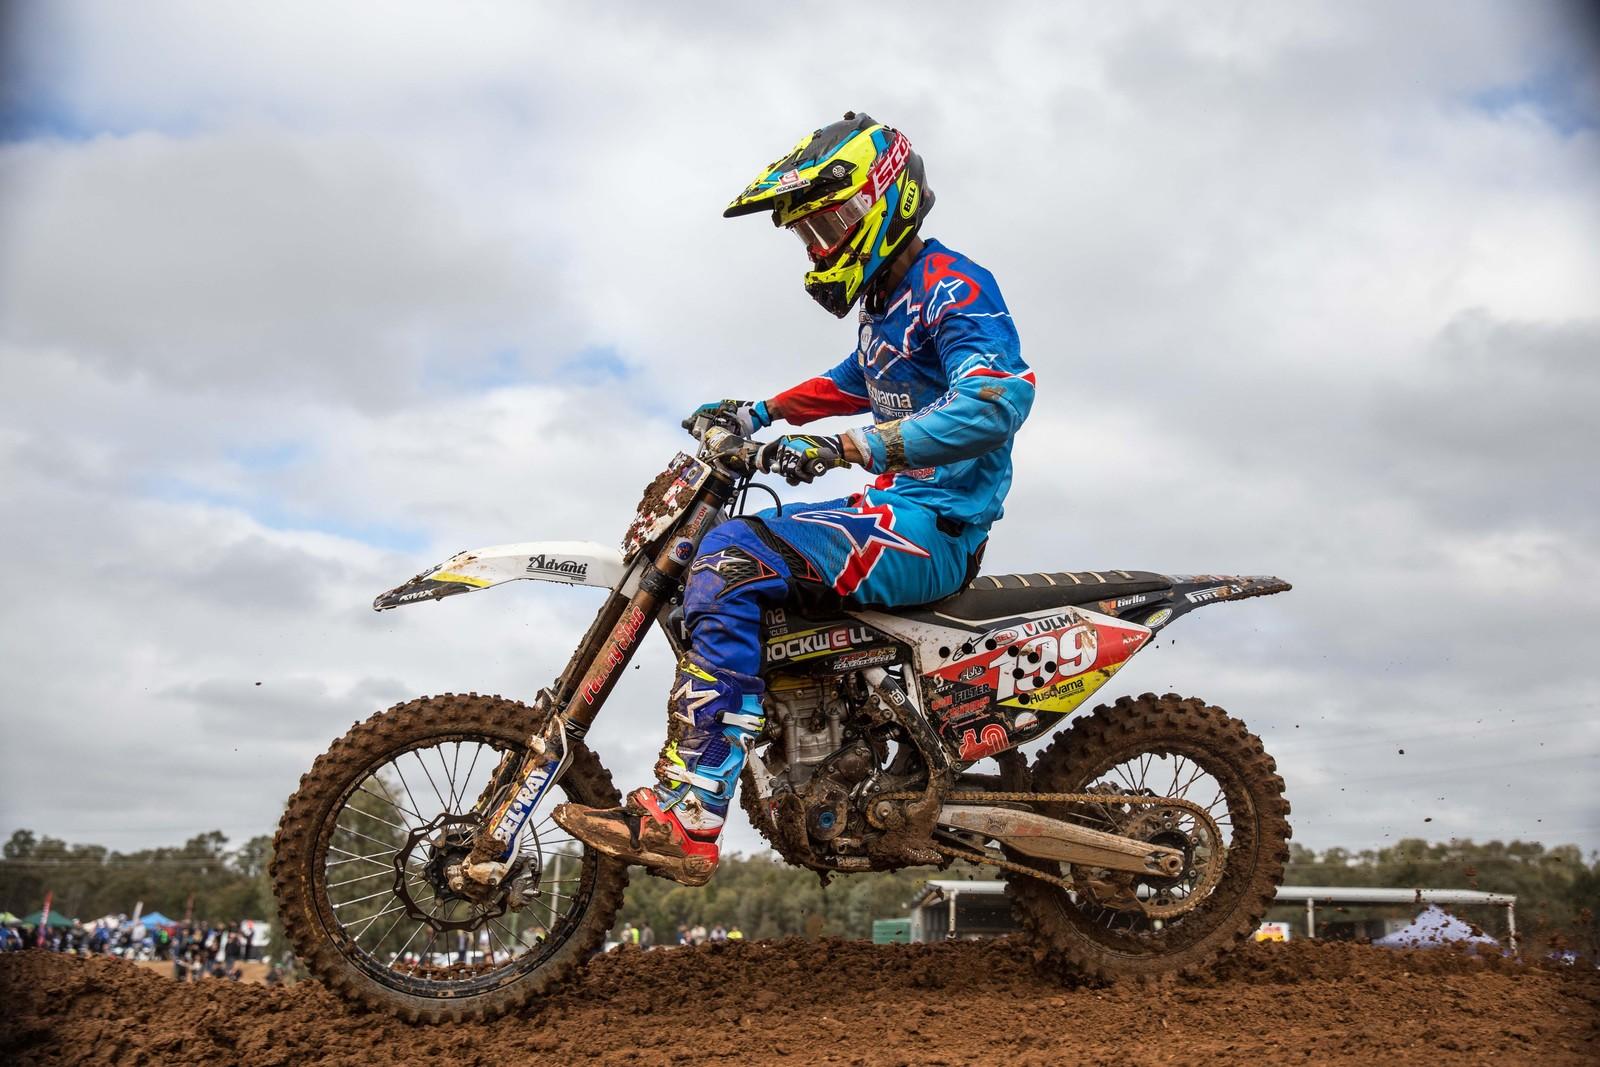 Nathan Crawford - Australian Motul MX Championships: Round 8, Shepparton - Motocross Pictures - Vital MX